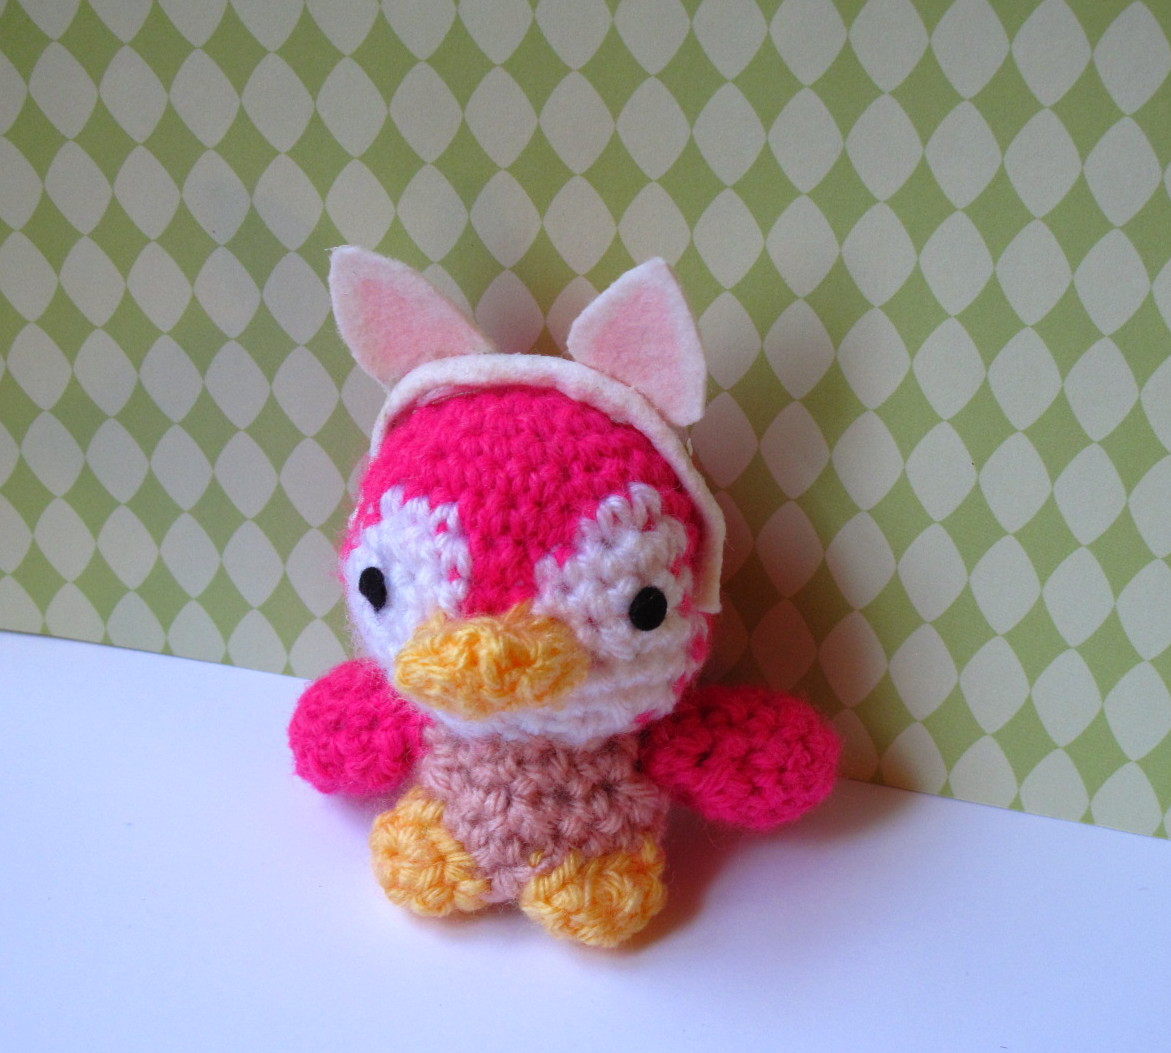 Amigurumi Crochet Designers : Eve Leder, Craft Designer : Bunny Ears for Petunia Penguin